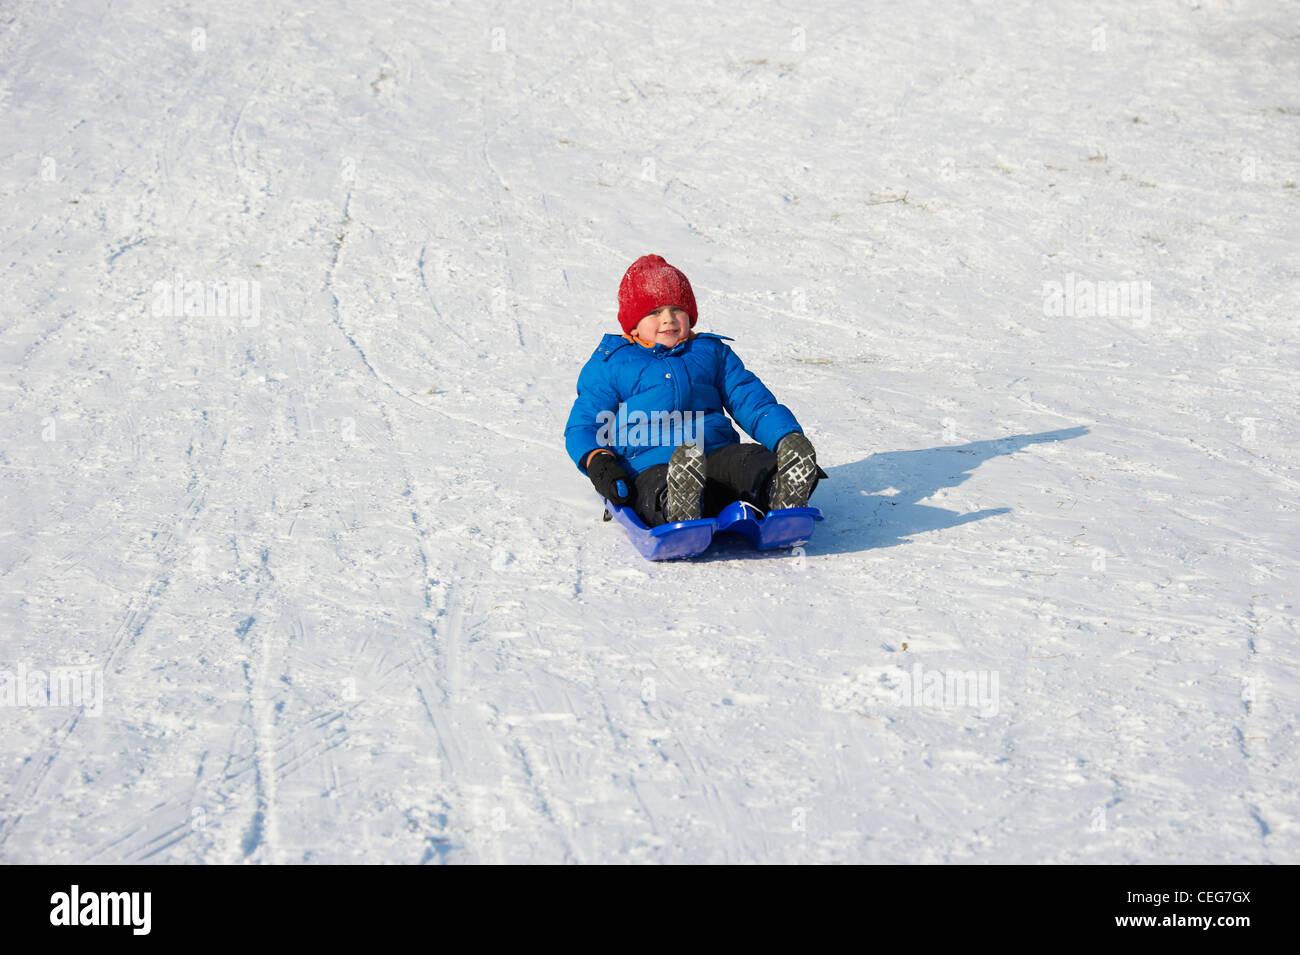 41206a663 A child little boy sledding downhill winter Stock Photo: 43383114 ...